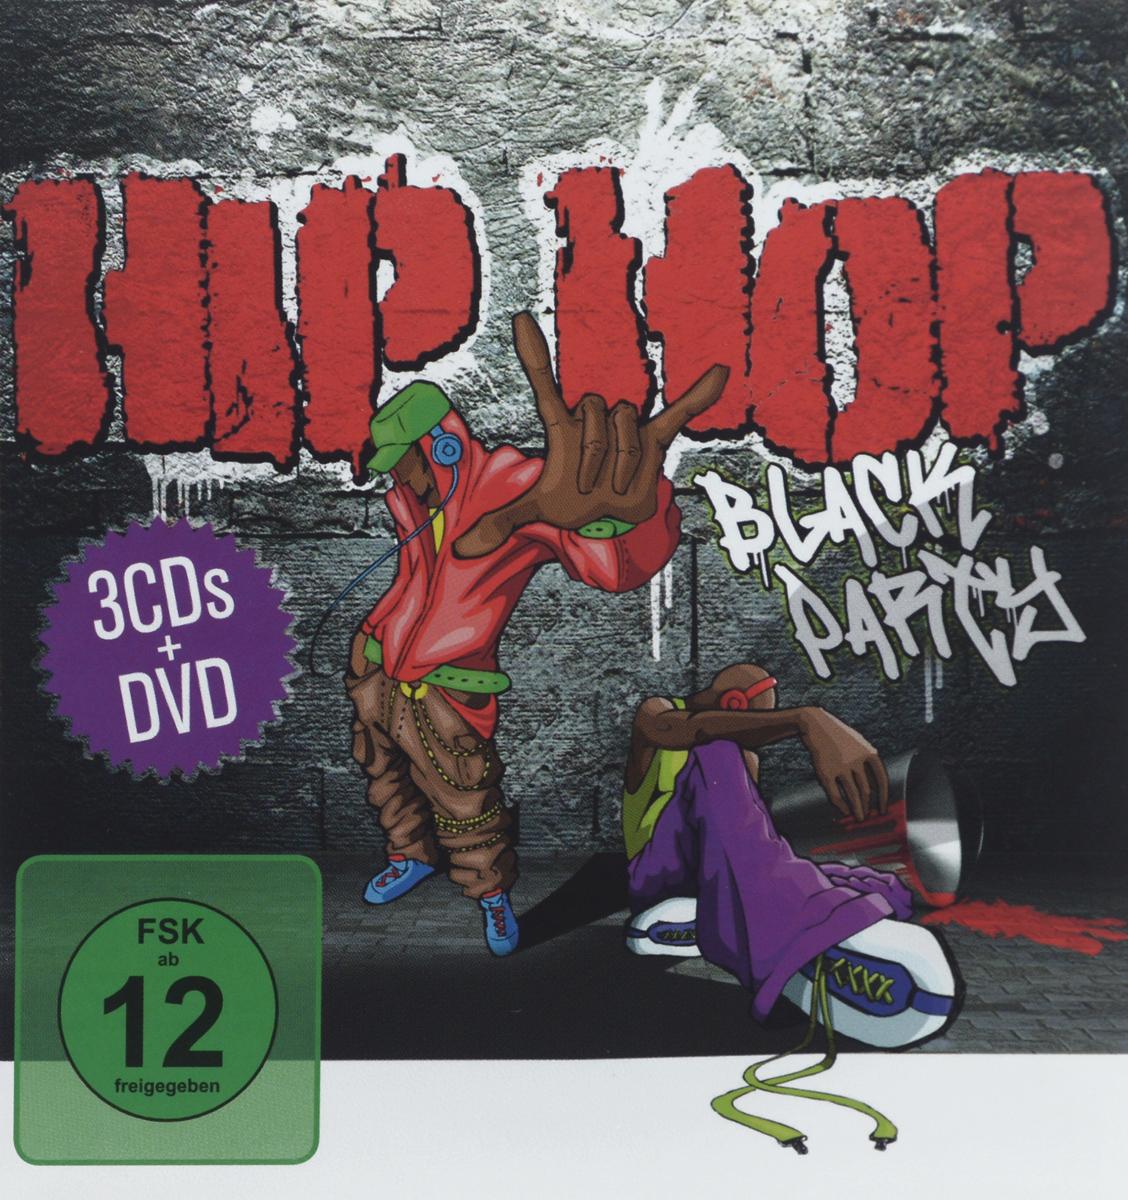 "Coolio,Эминем,J-Black,Masta Ace,Steele,Mista Cheeks,Cocoa Brovas,Tomorrow's Weapons,GHG,Illa Noize,Royal Flush,151-Ron Bacardi,Rah Bump,Big Daddy Kane,Грег Мак,Master Fuol,""Das Efx"",Mr. Raw,Deacon Da Villain,Heltah Skeltah,""KRS-One"",Infamous Mobb,""The Prodigy"" Hip Hop Black Party (3 CD + DVD)"